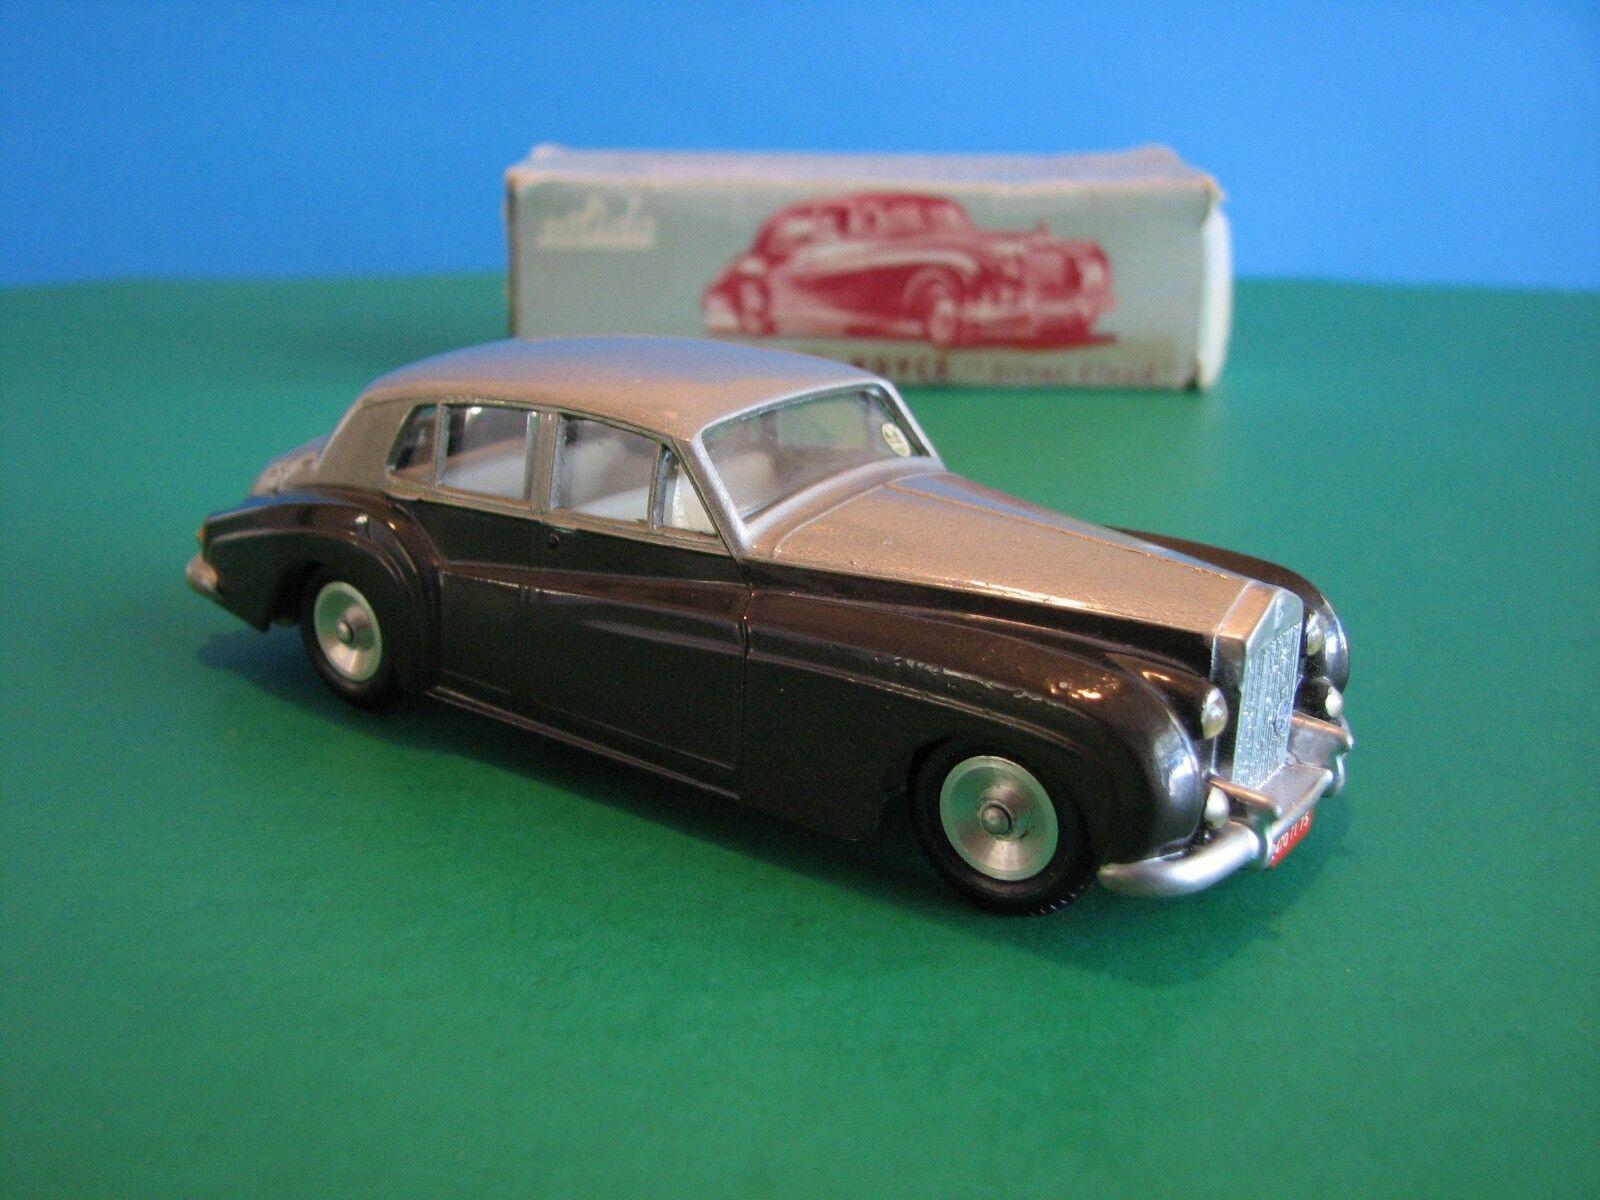 Solido 115, Rolls Royce Plata Nube Con Caja - 1/43 escala Diecast-Francia